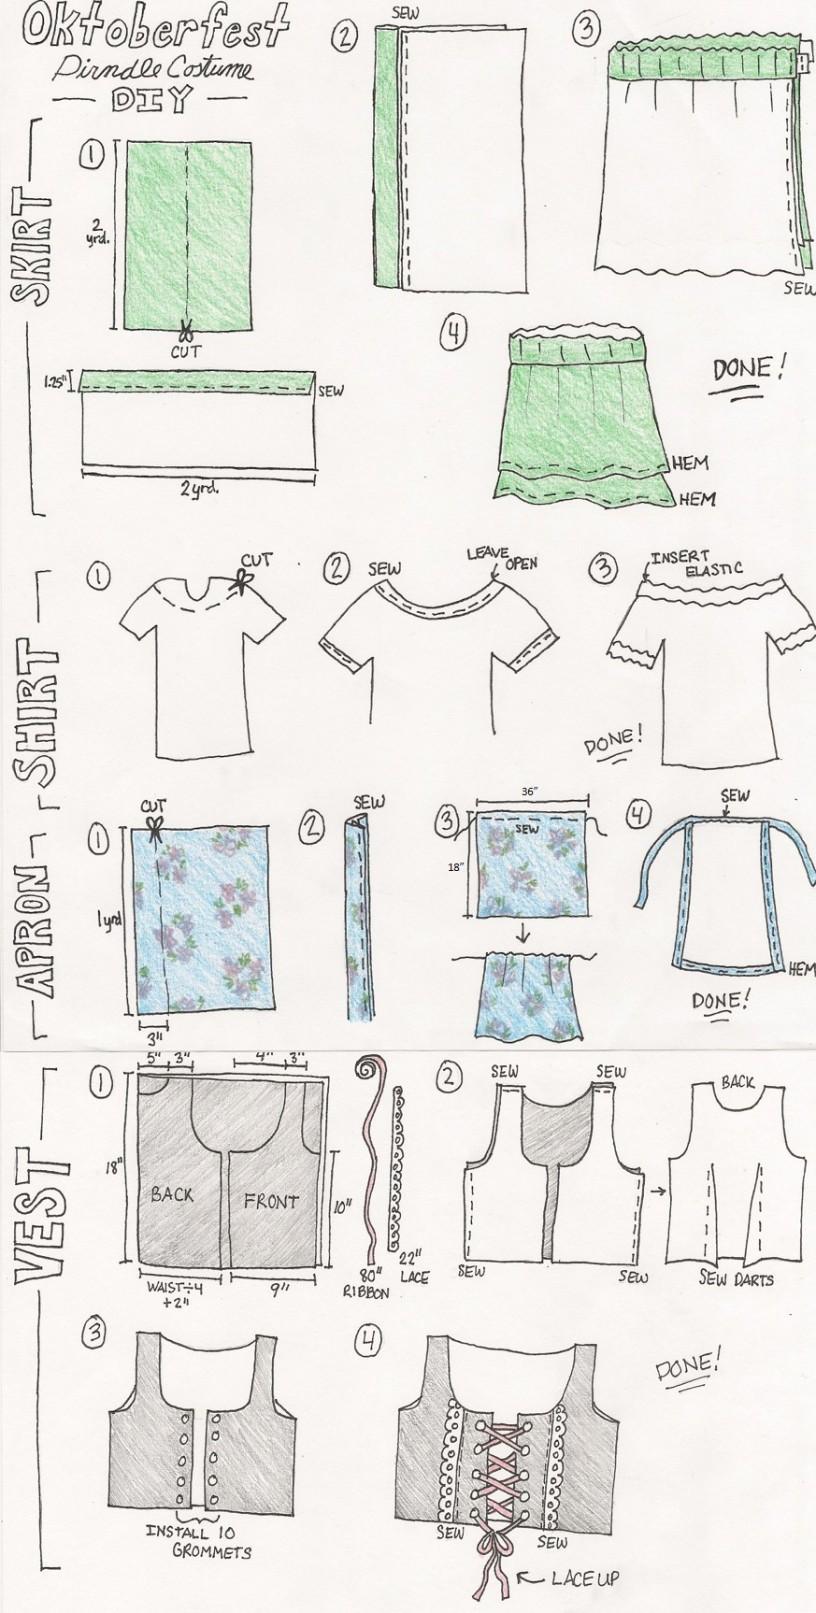 oktoberfest-dirndl-costume-instructions-by-bunny-baubles-blog